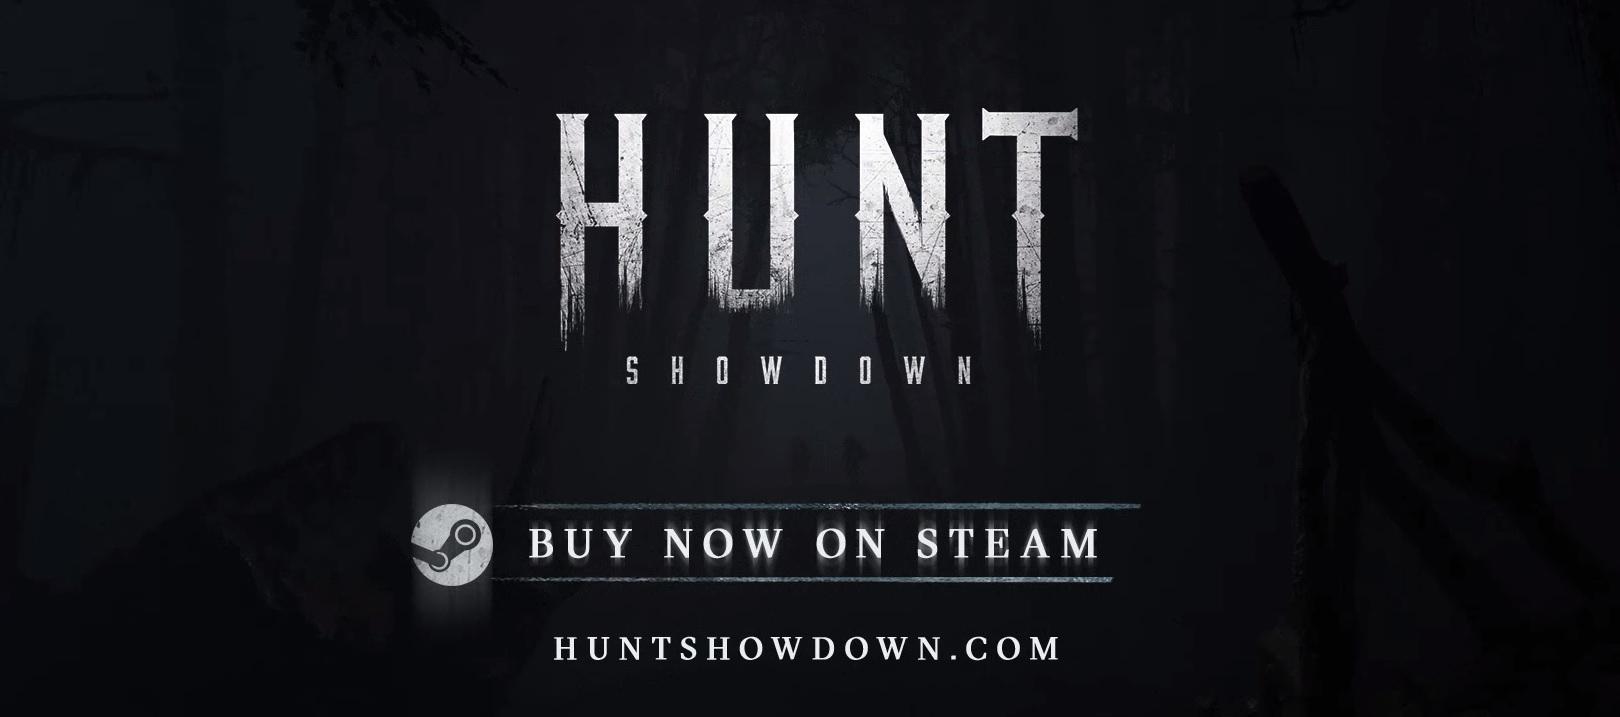 Hunt Showdown ya está disponible en Early Access